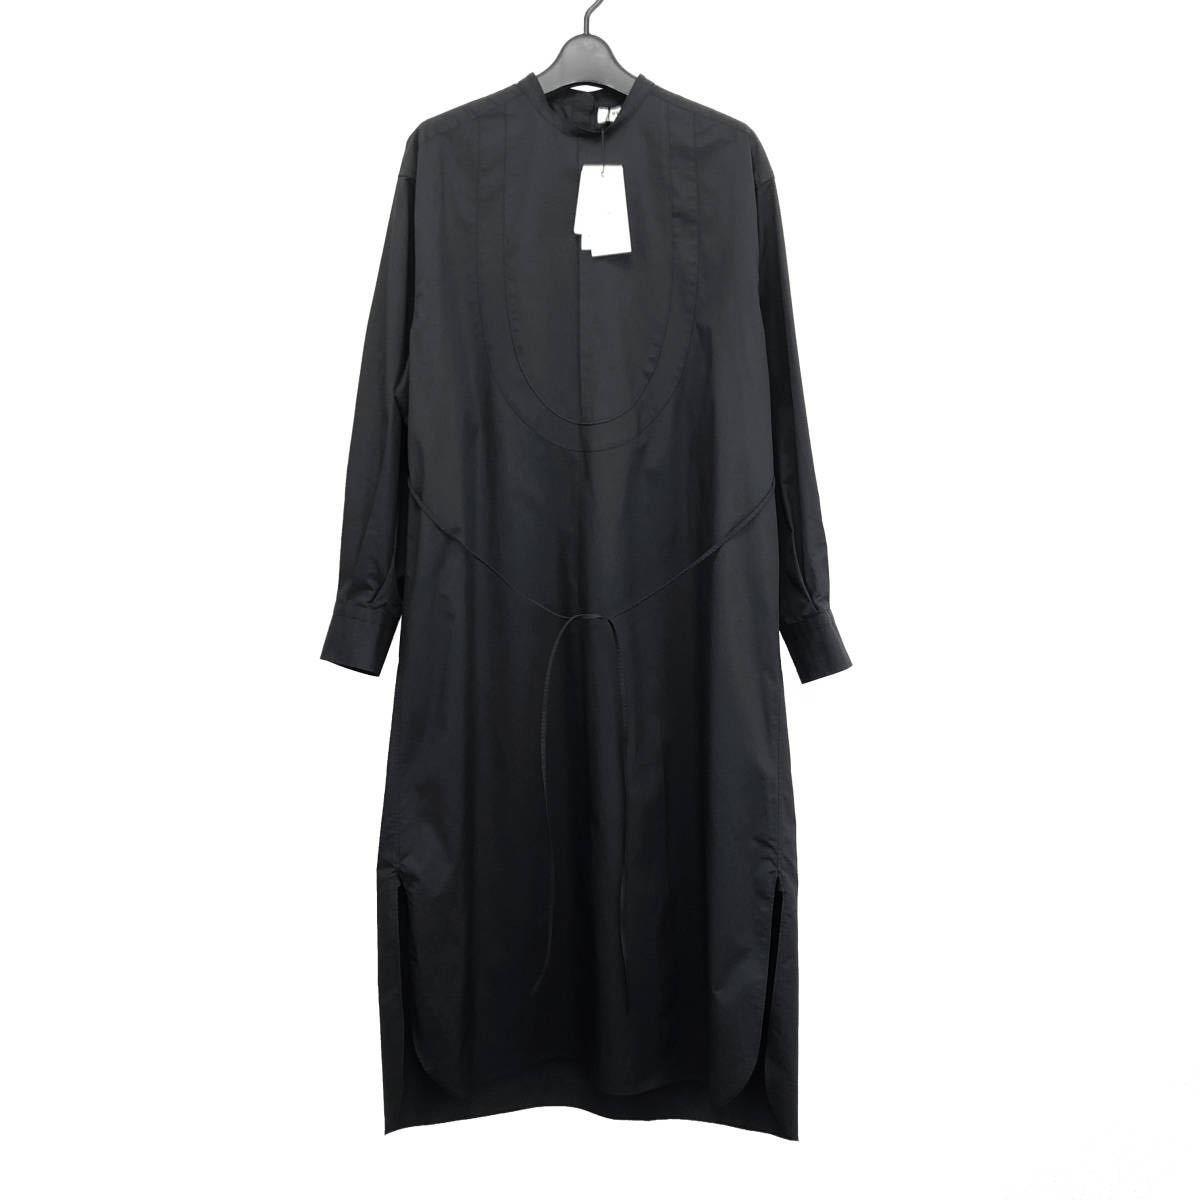 HYKE ハイク 20AW BIB FRONT SHIRT DRESS ビブフロントシャツワンピース 15114